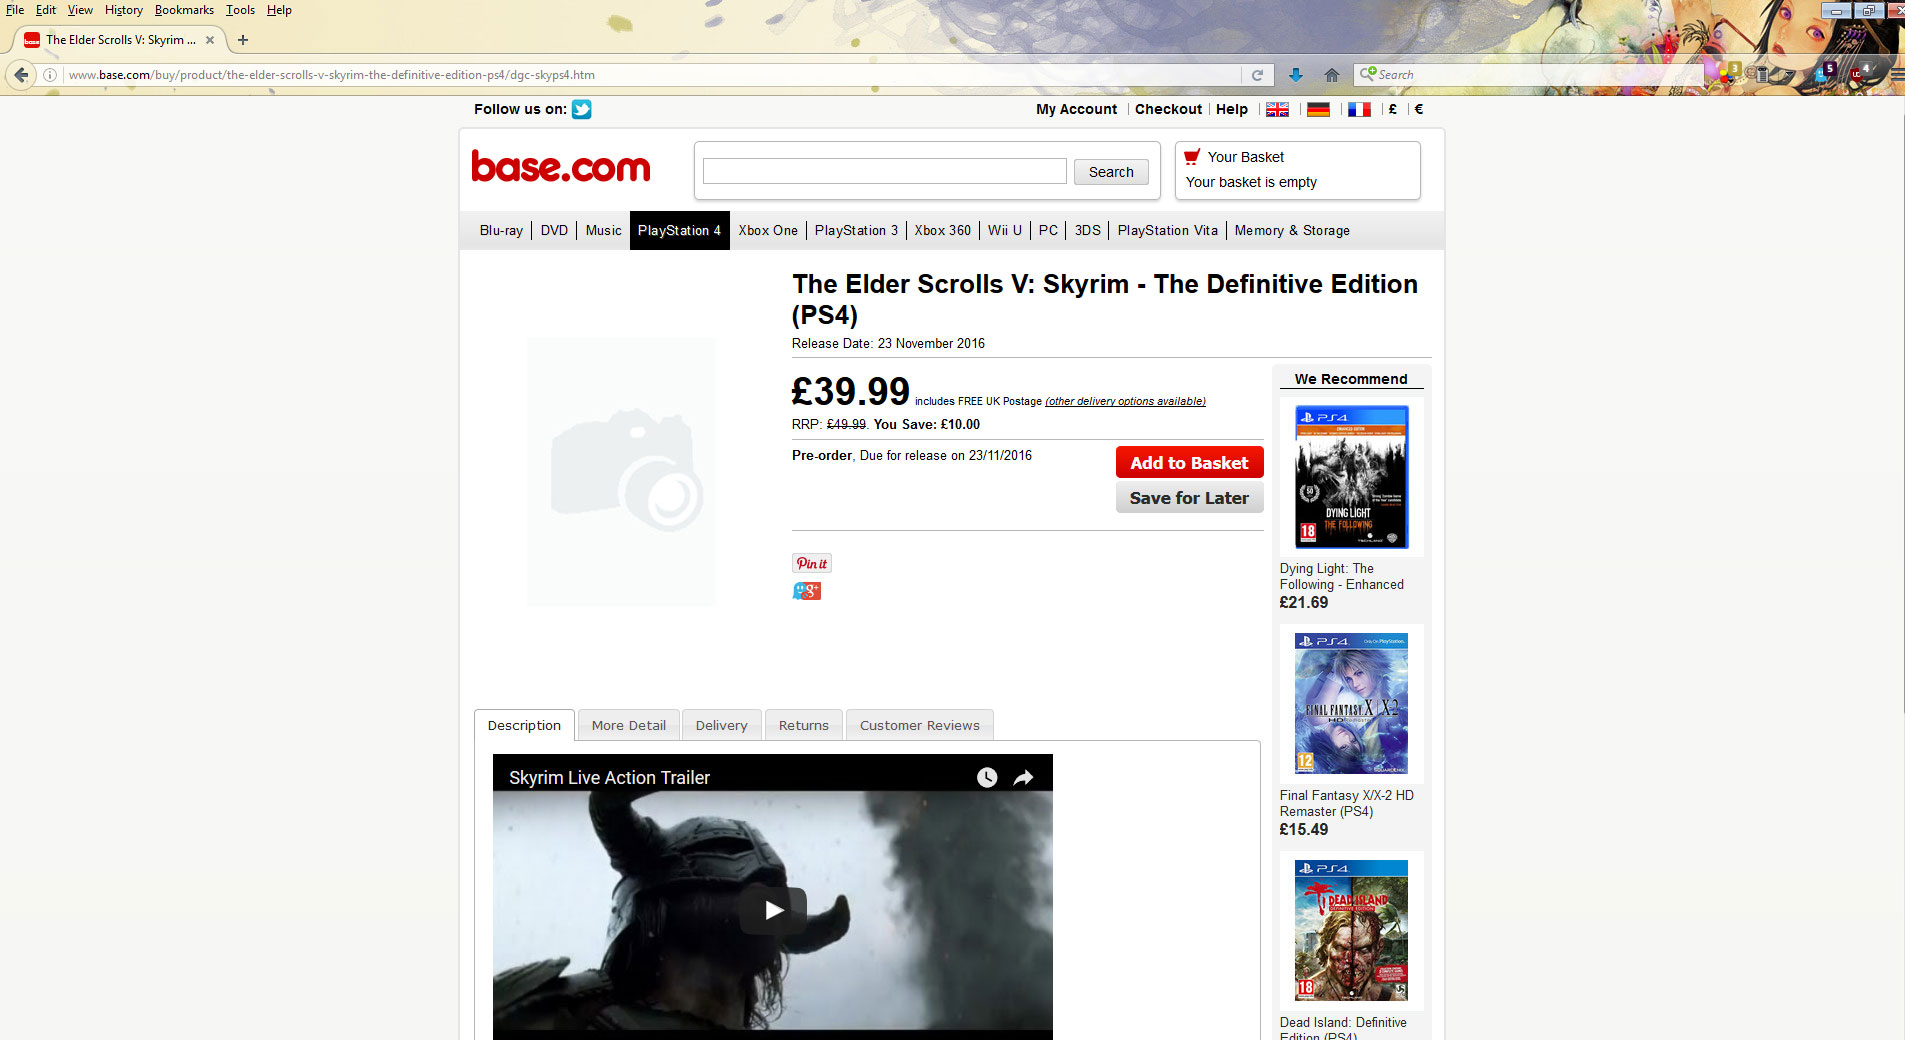 The Elder Scrolls V Skyrim Definitive Edition